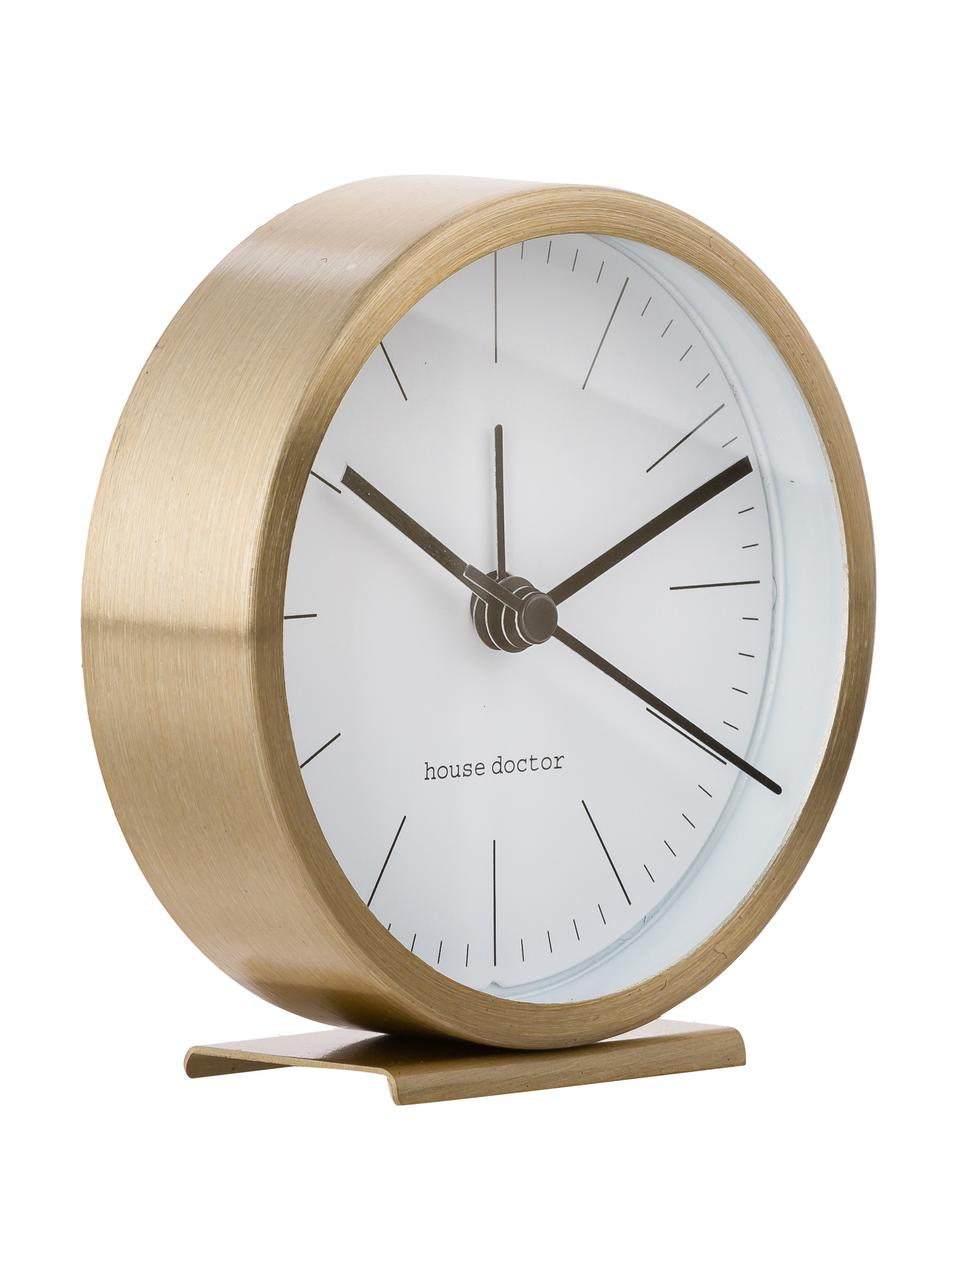 Wecker Hannah, Rahmen: Aluminium, Front: Glas, Ziffernblatt: Papier, Goldfarben, Ø 9 x H 9 cm